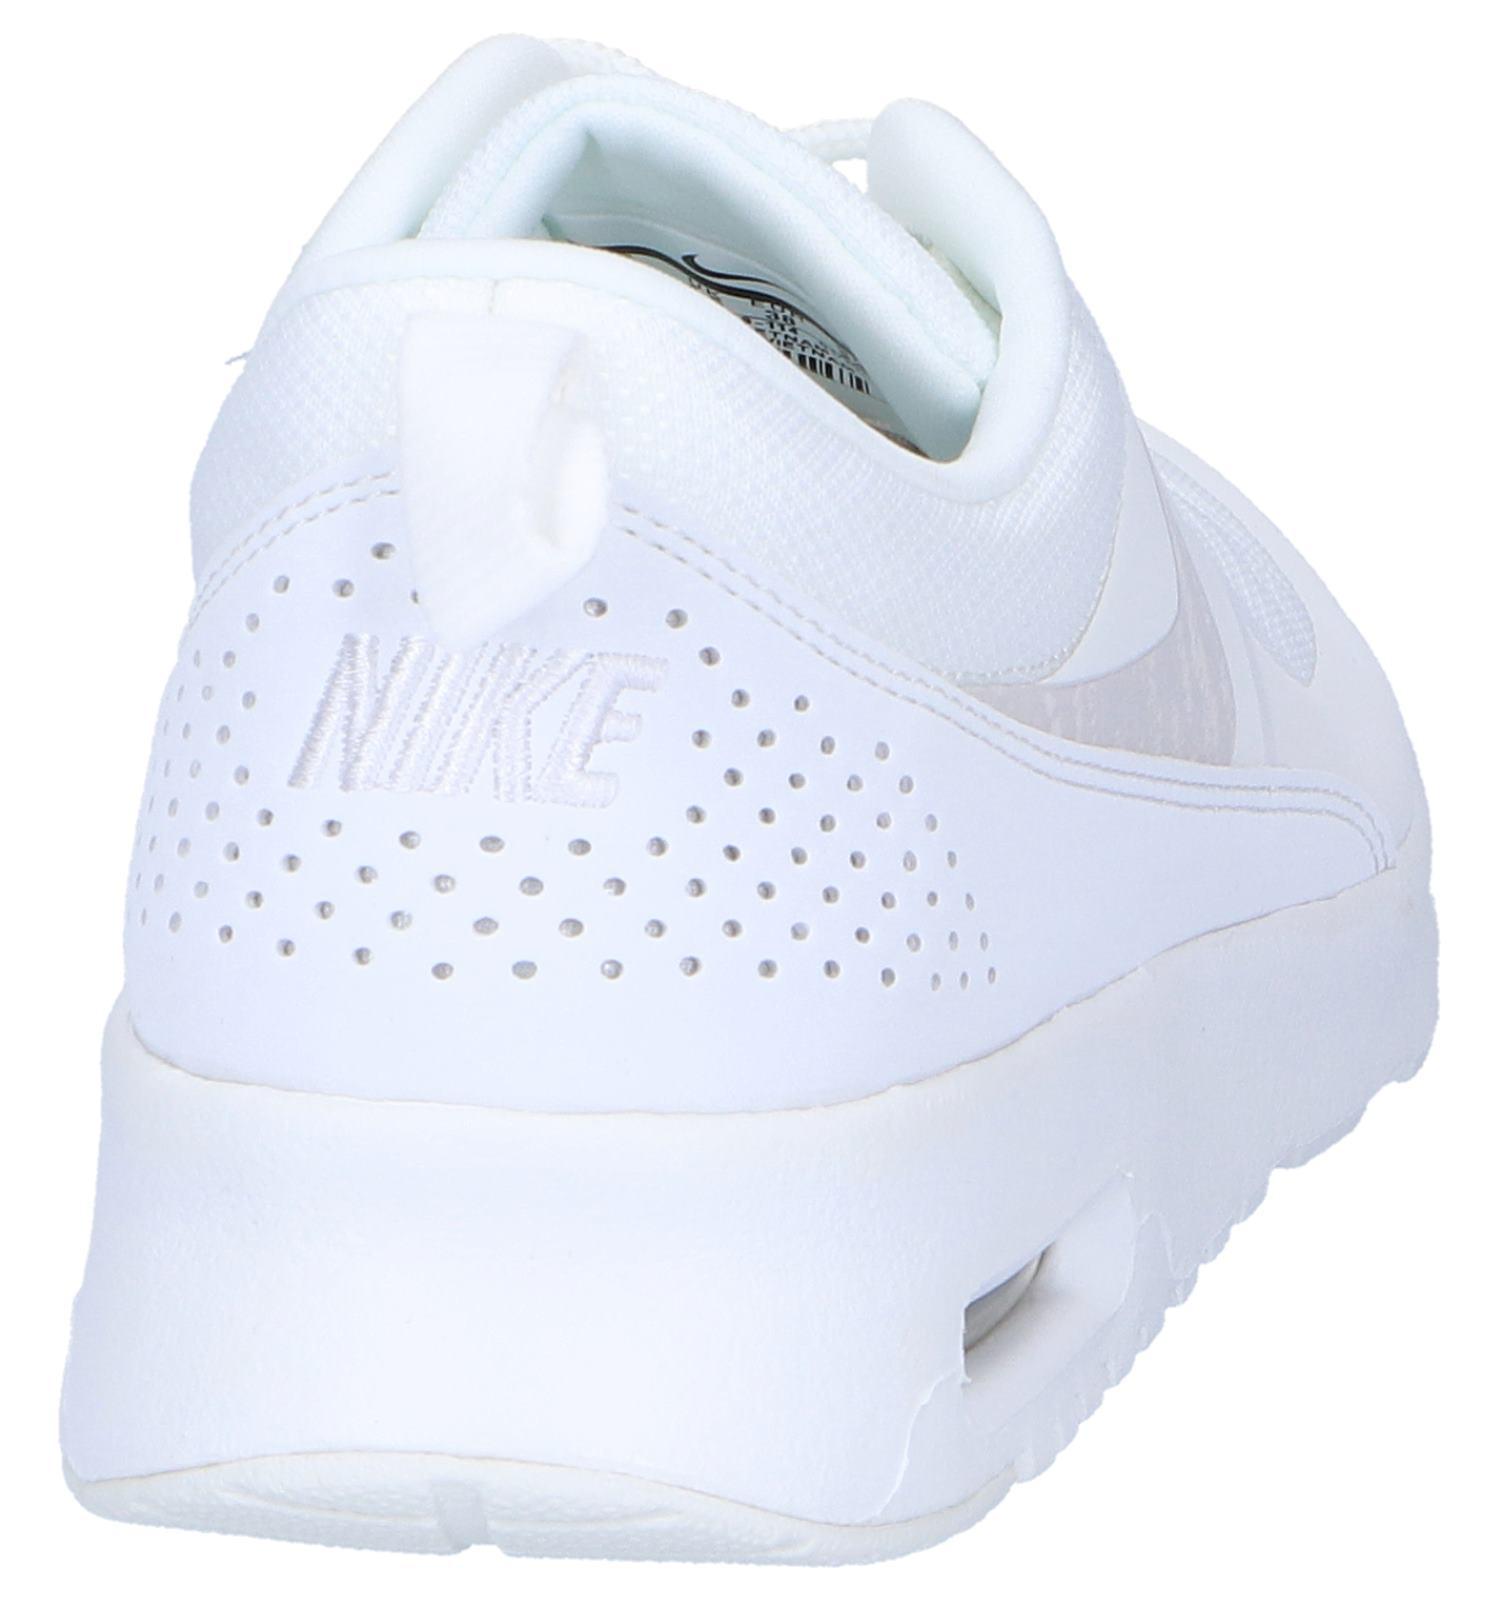 Witte Sneakers Nike Air Max Thea | SCHOENENTORFS.NL | Gratis